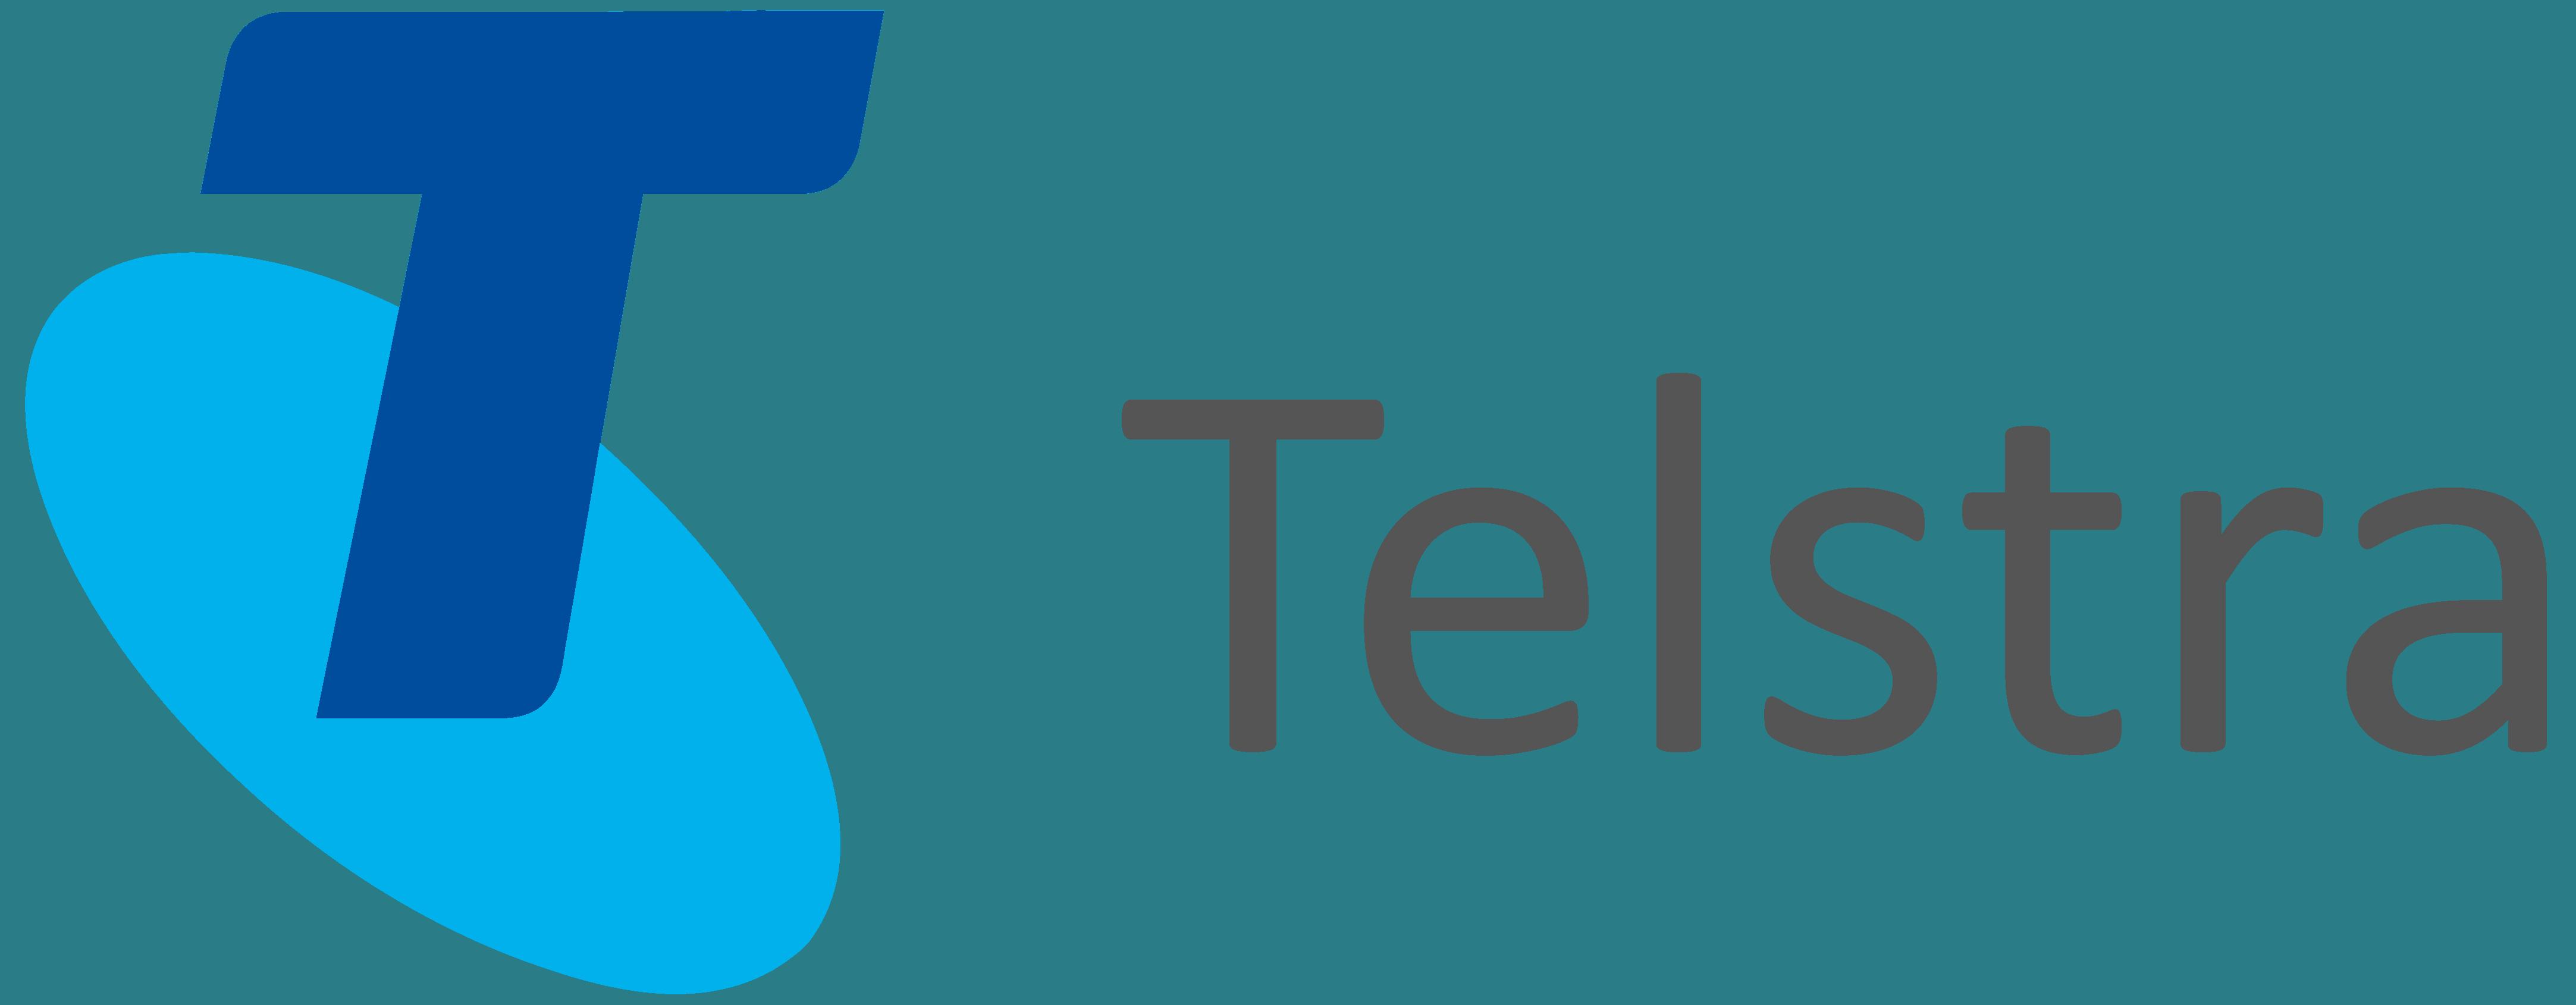 Telstra student discounts logo